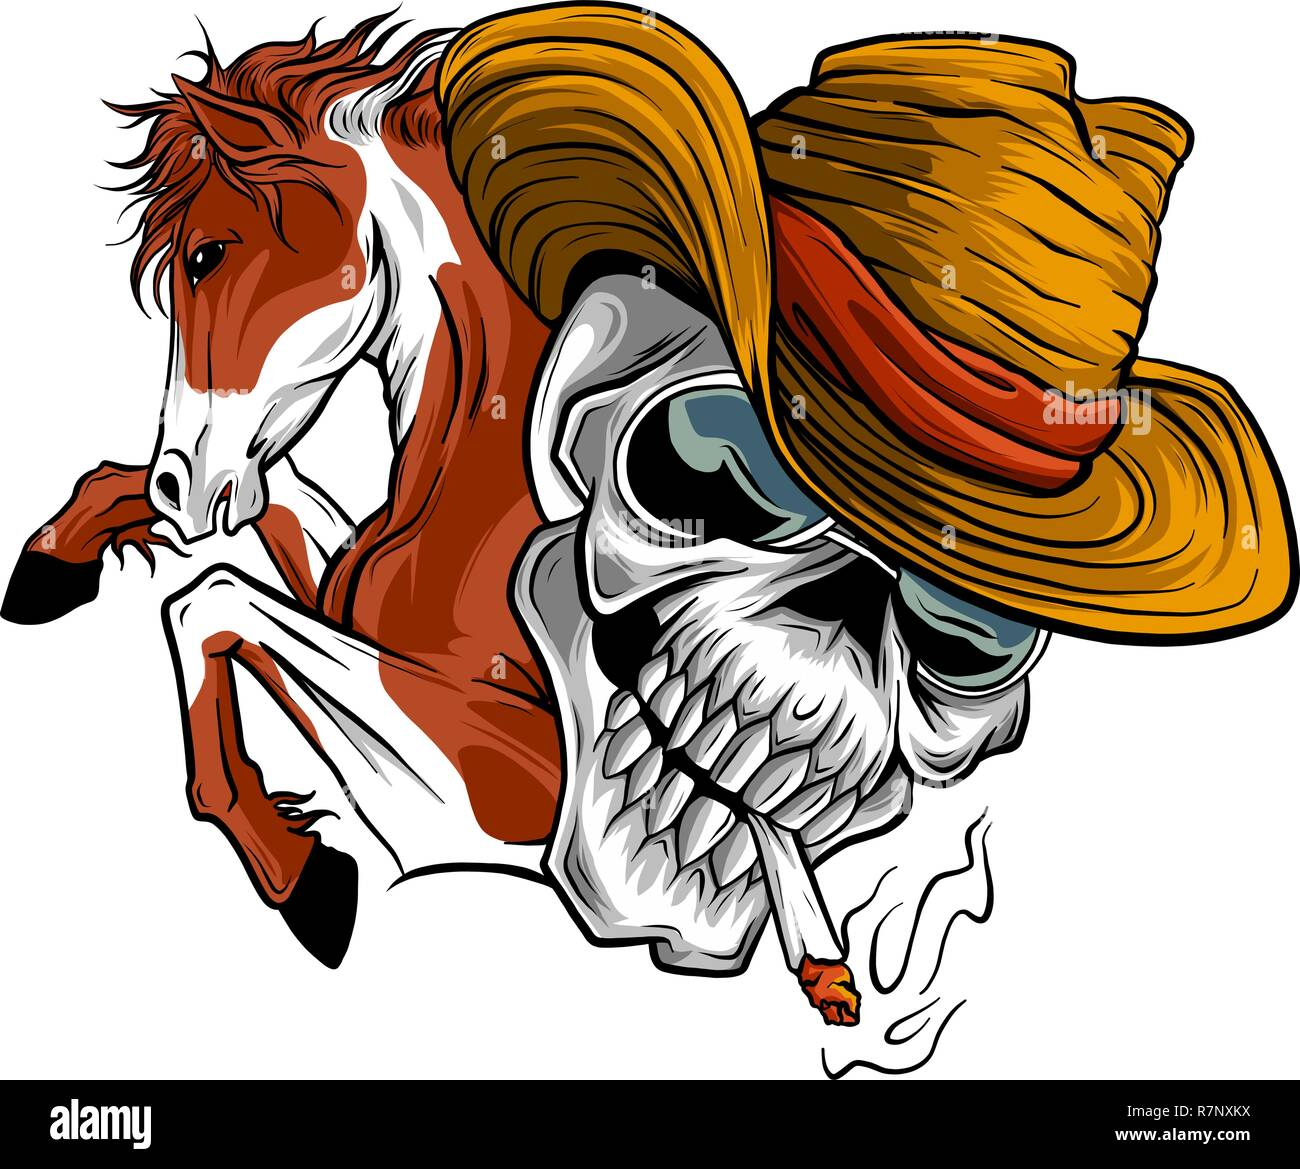 vector illustration skull cowboy ride a horse - Stock Image